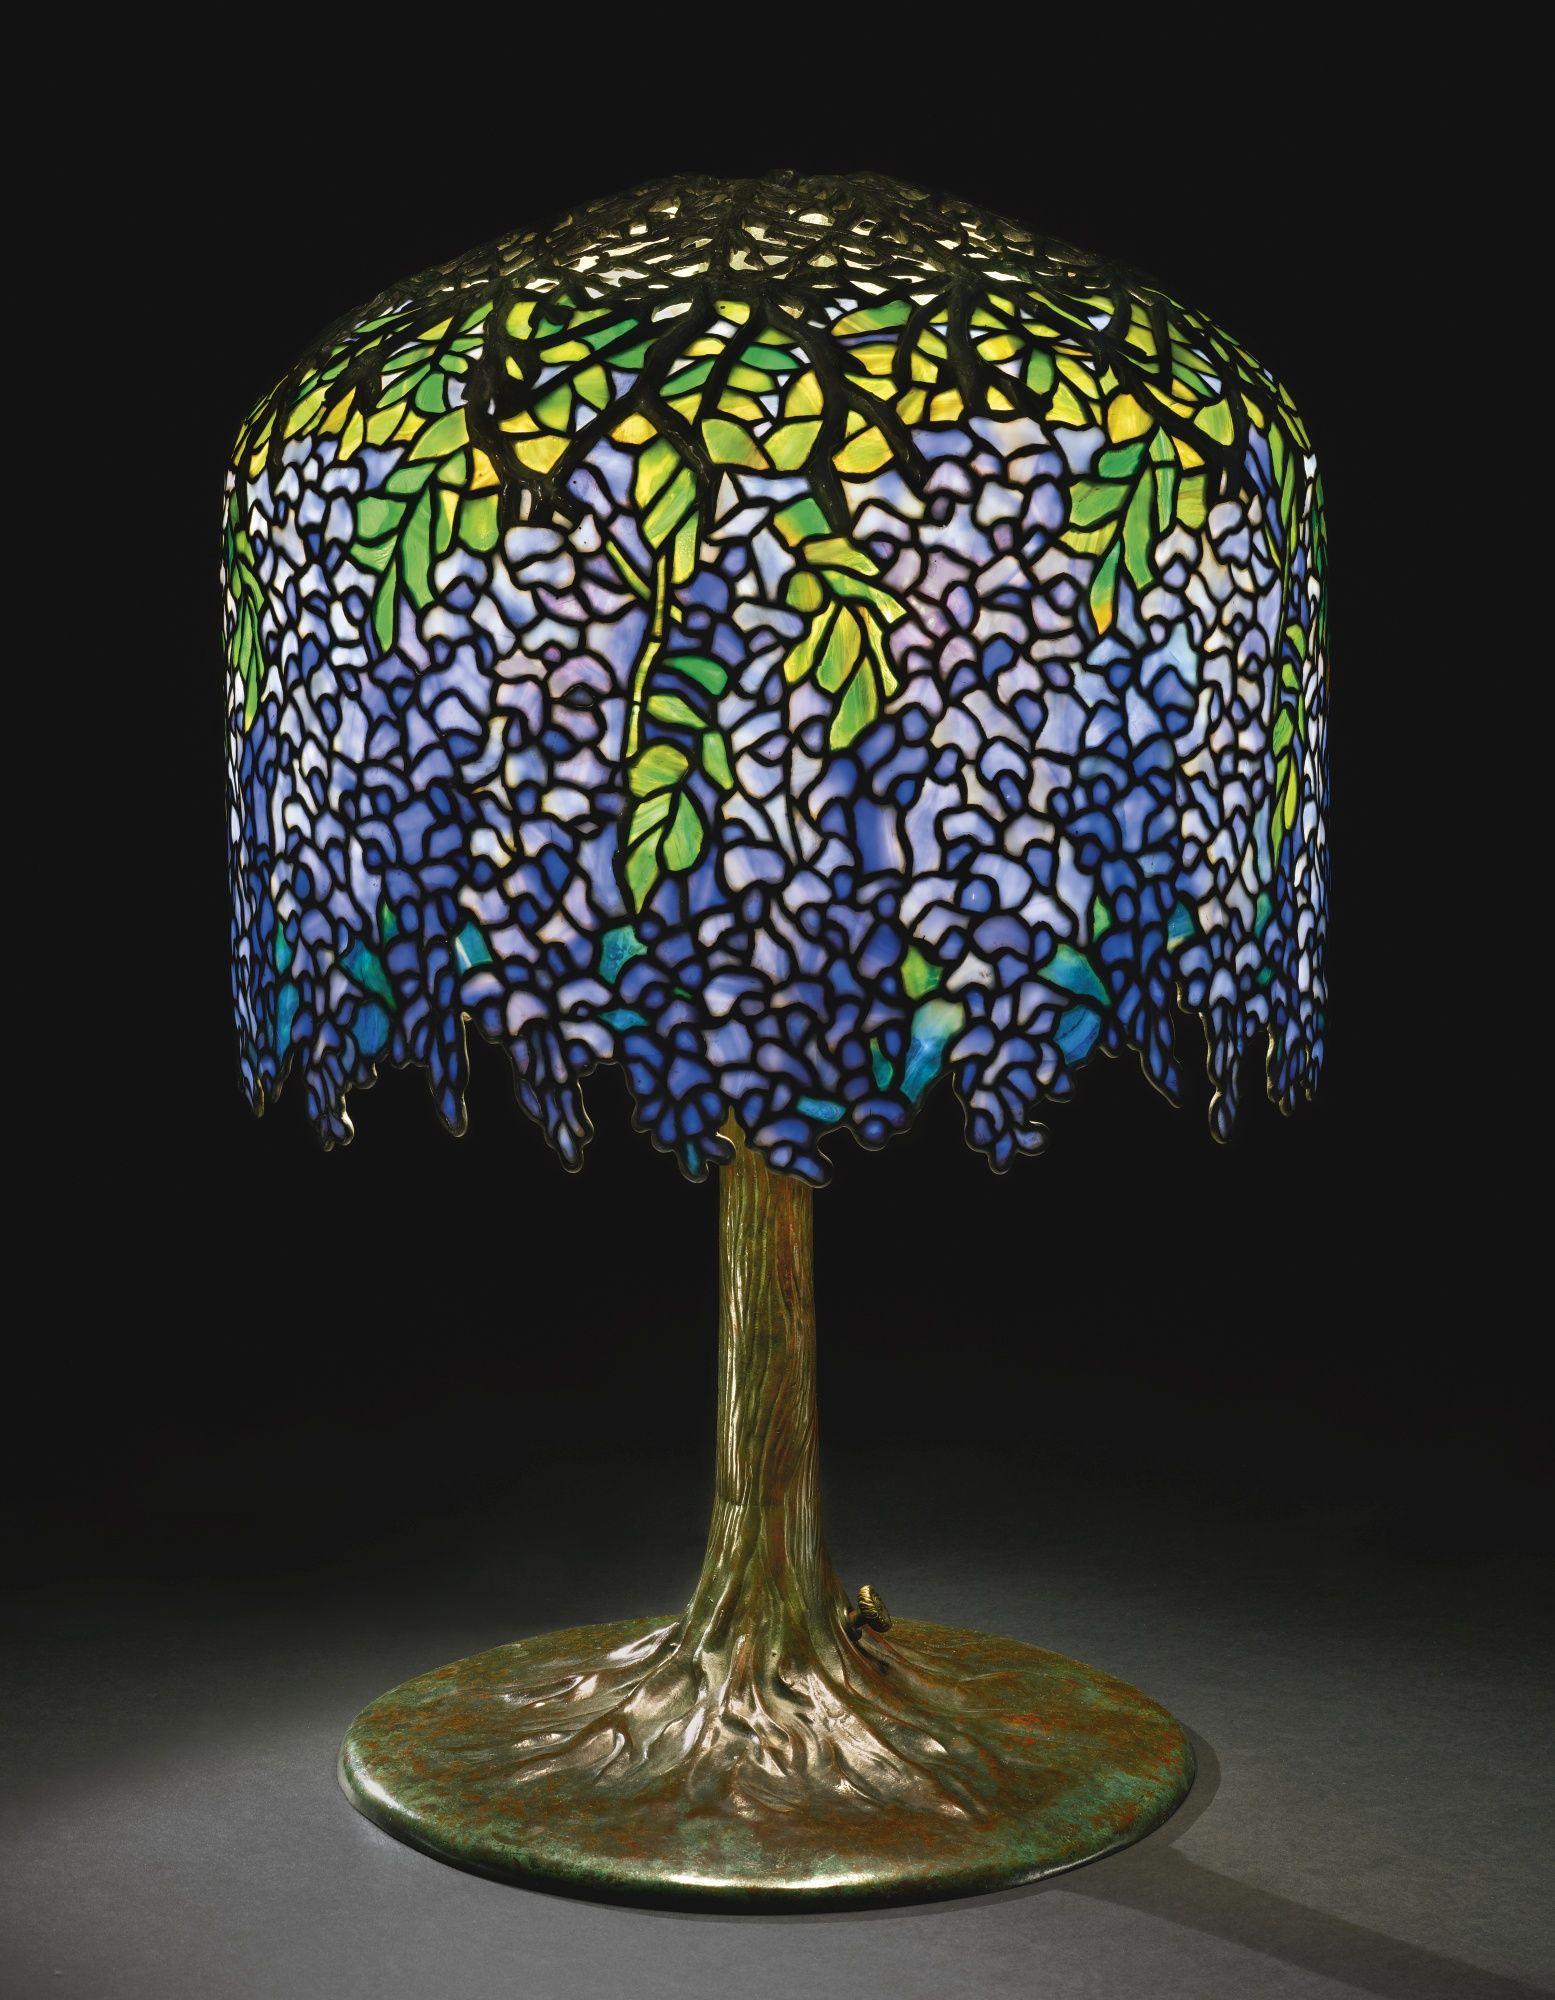 tiffany lamps  XRCSNFM